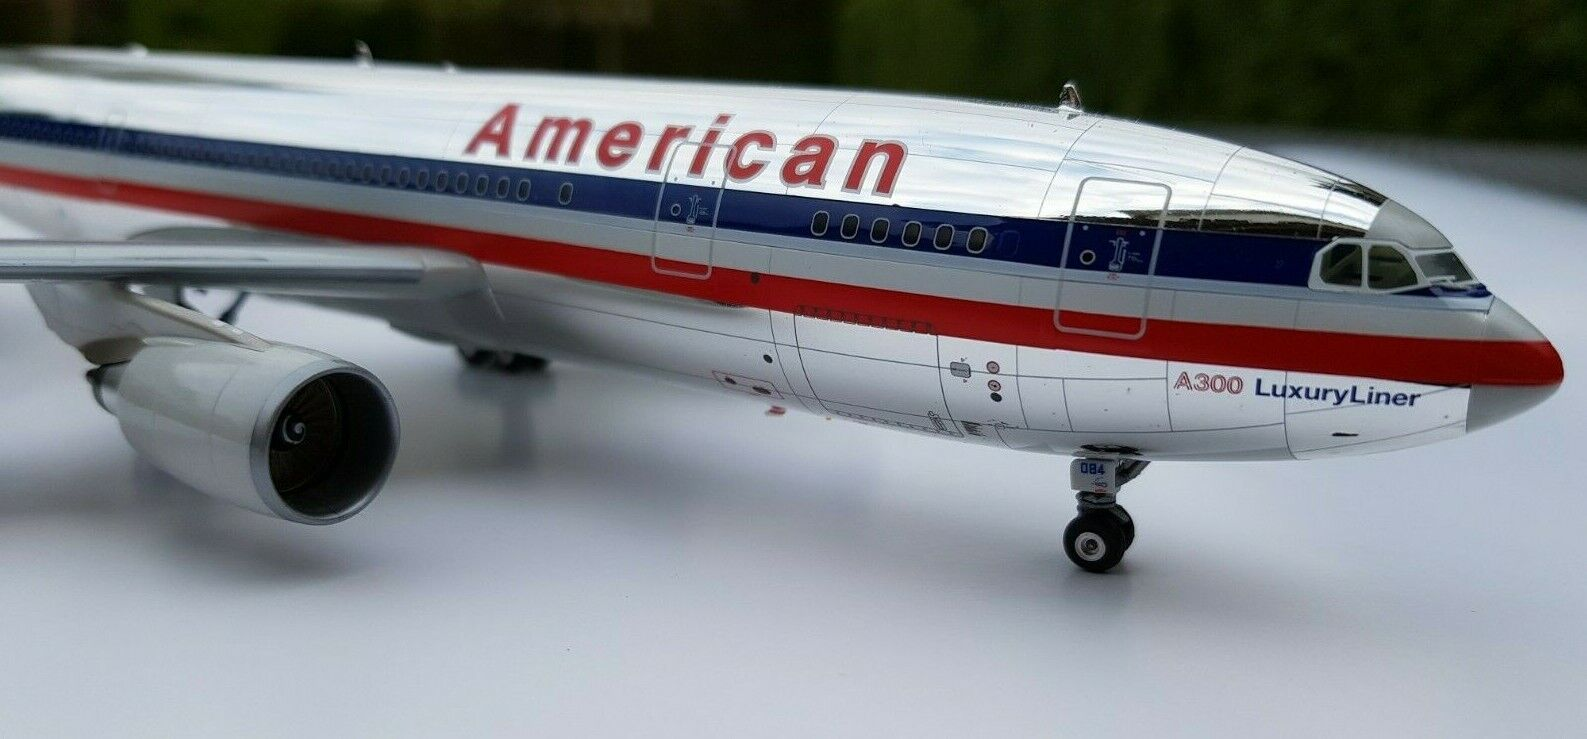 Herpa Premium 1 200 American Airlines Airbus a300-600 SUPER RARE 016353 Top